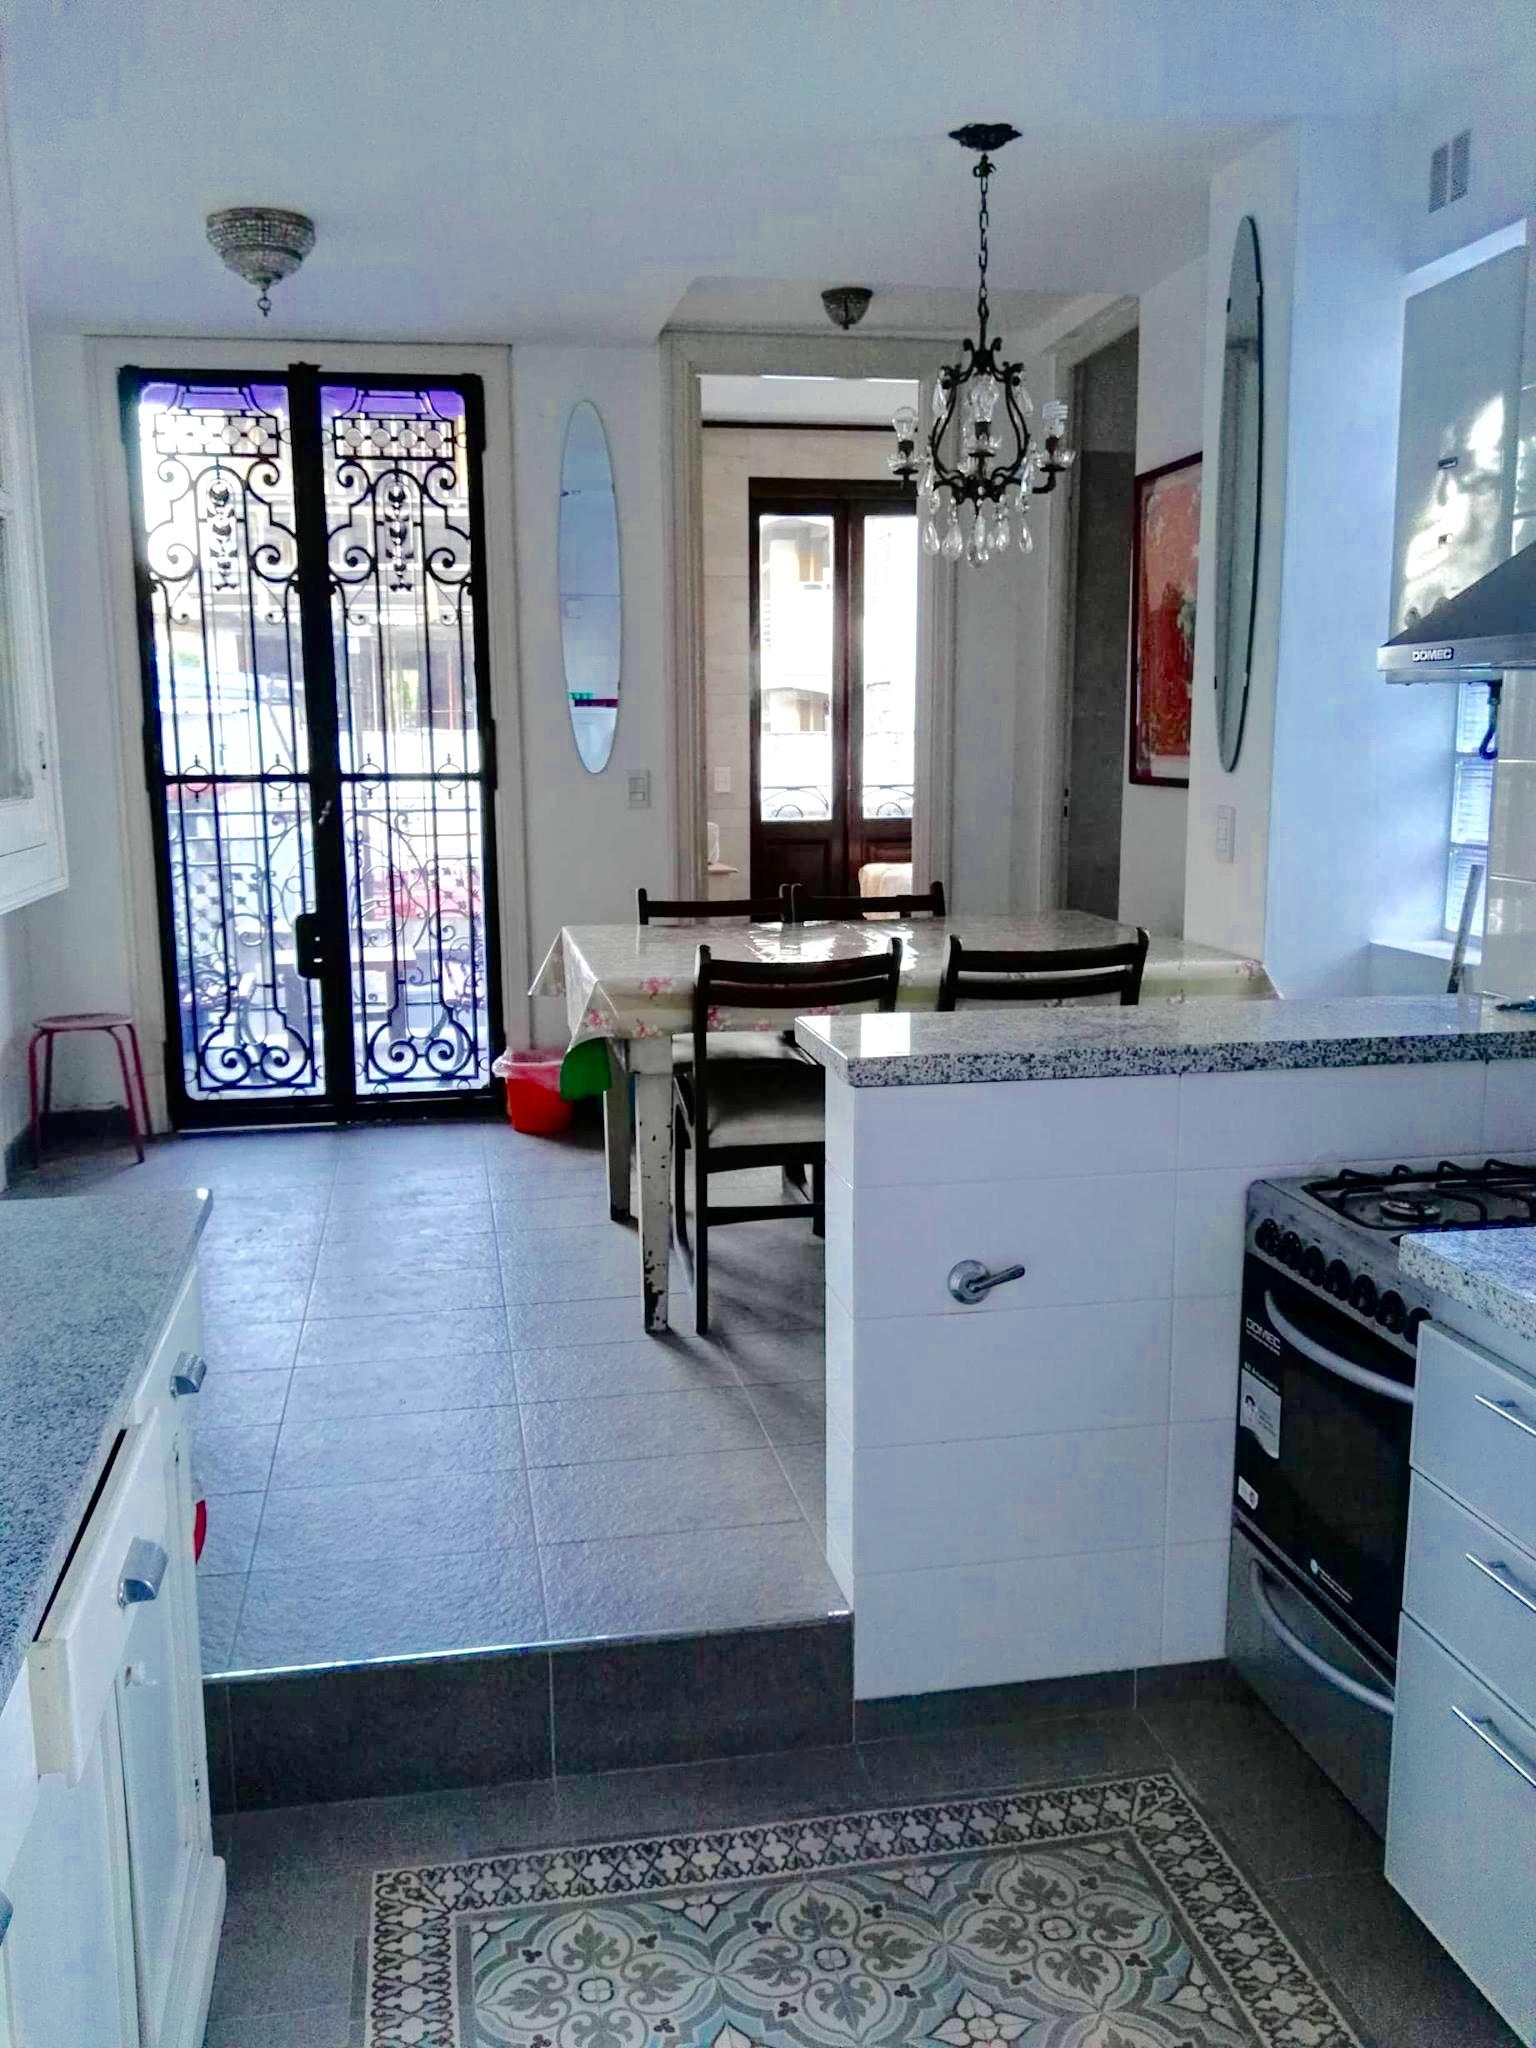 Luna Lila apartment